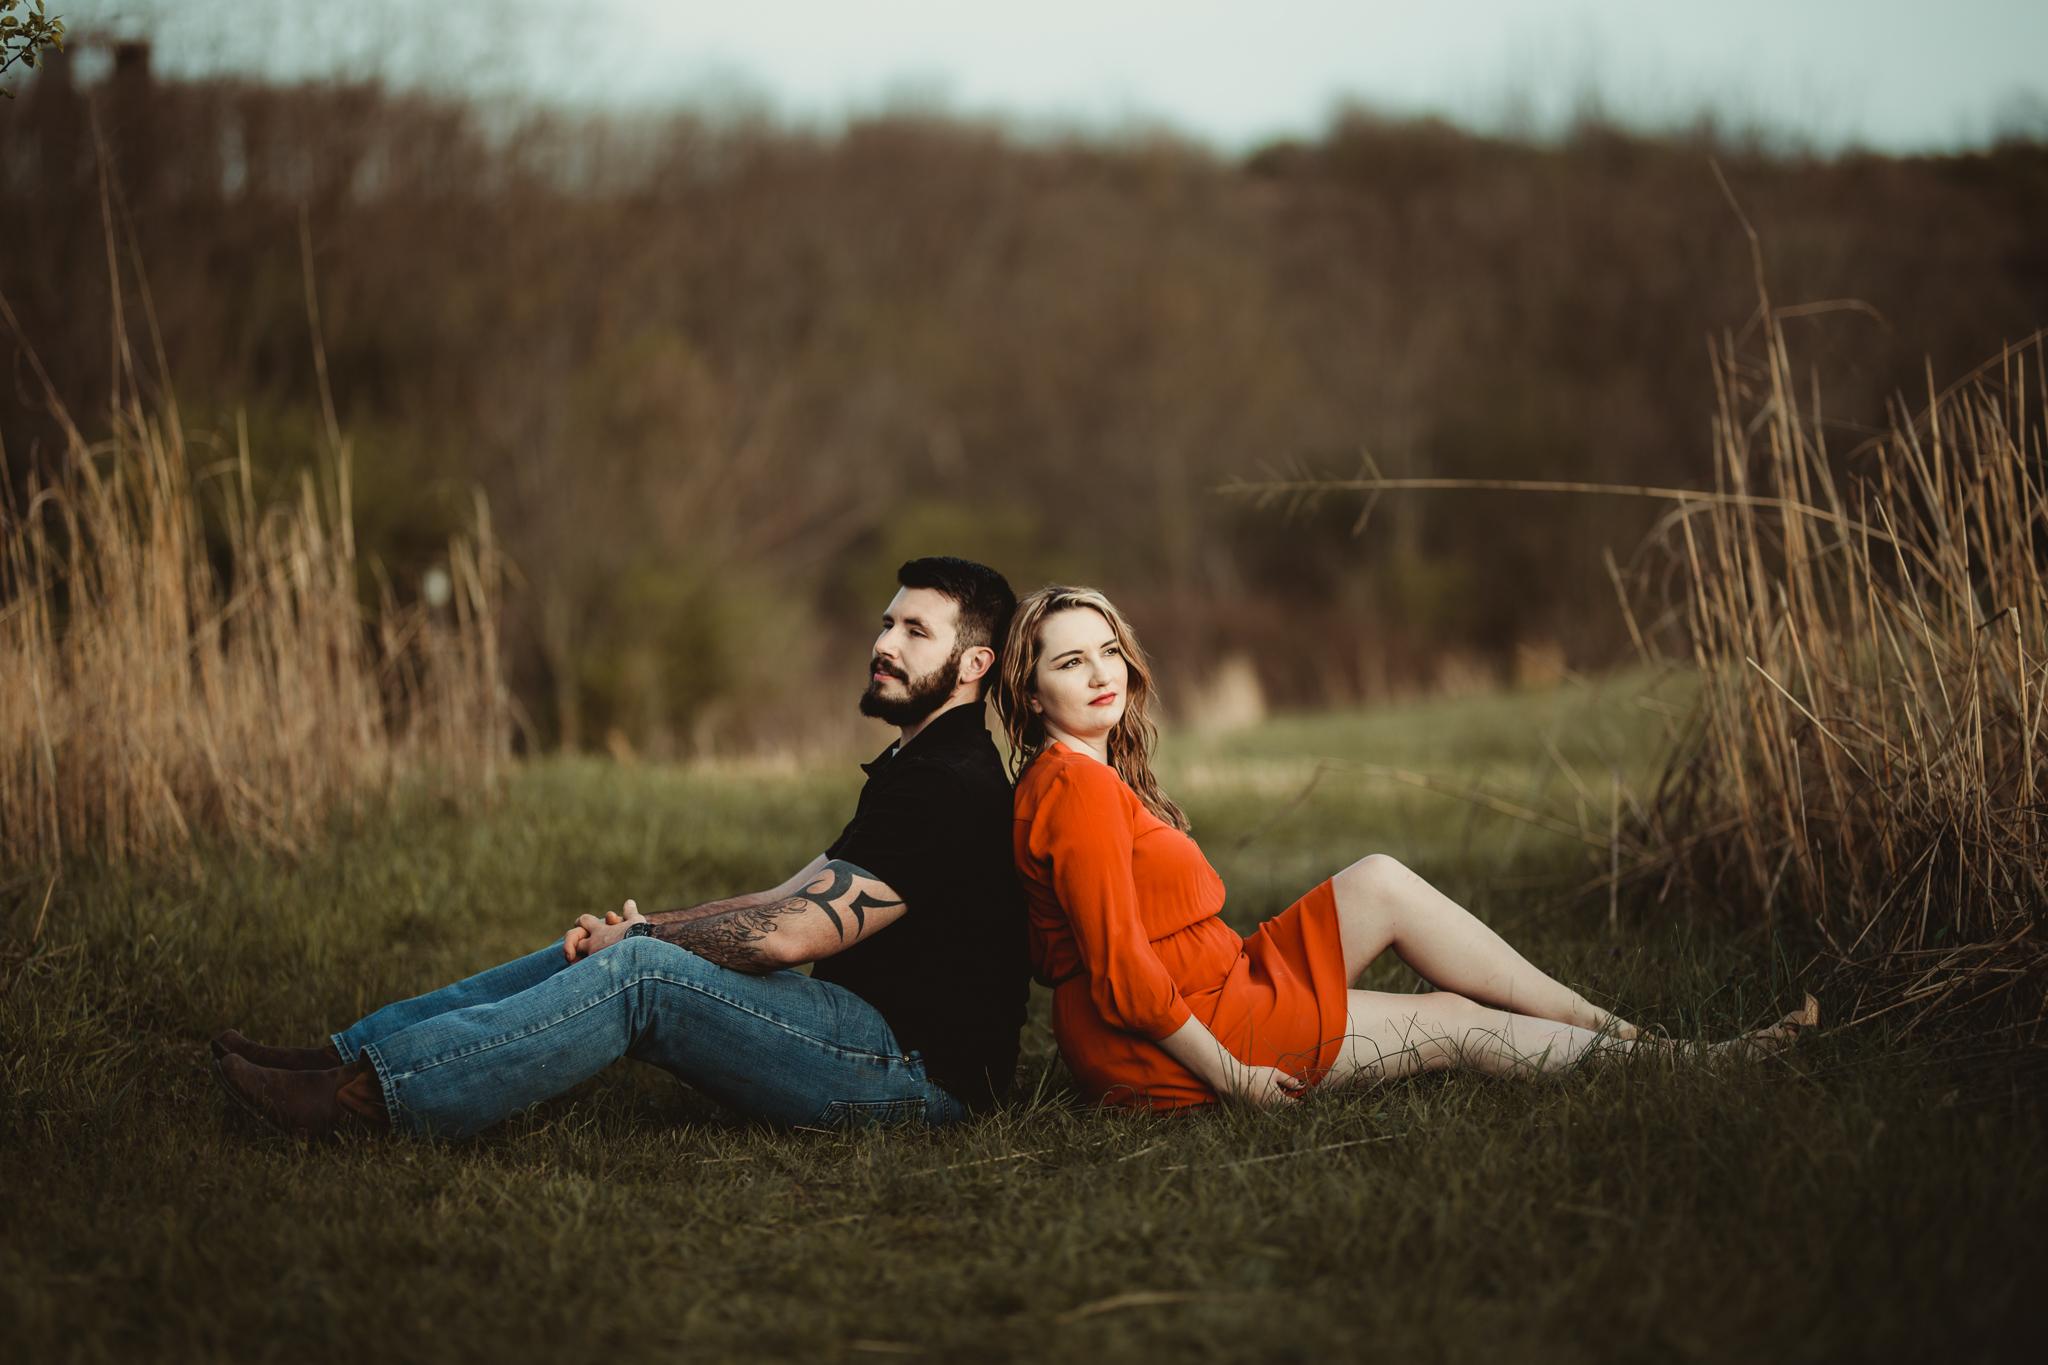 Richmond Kentucky Engagement Photographer - Ariana Jordan Photography -46.jpg